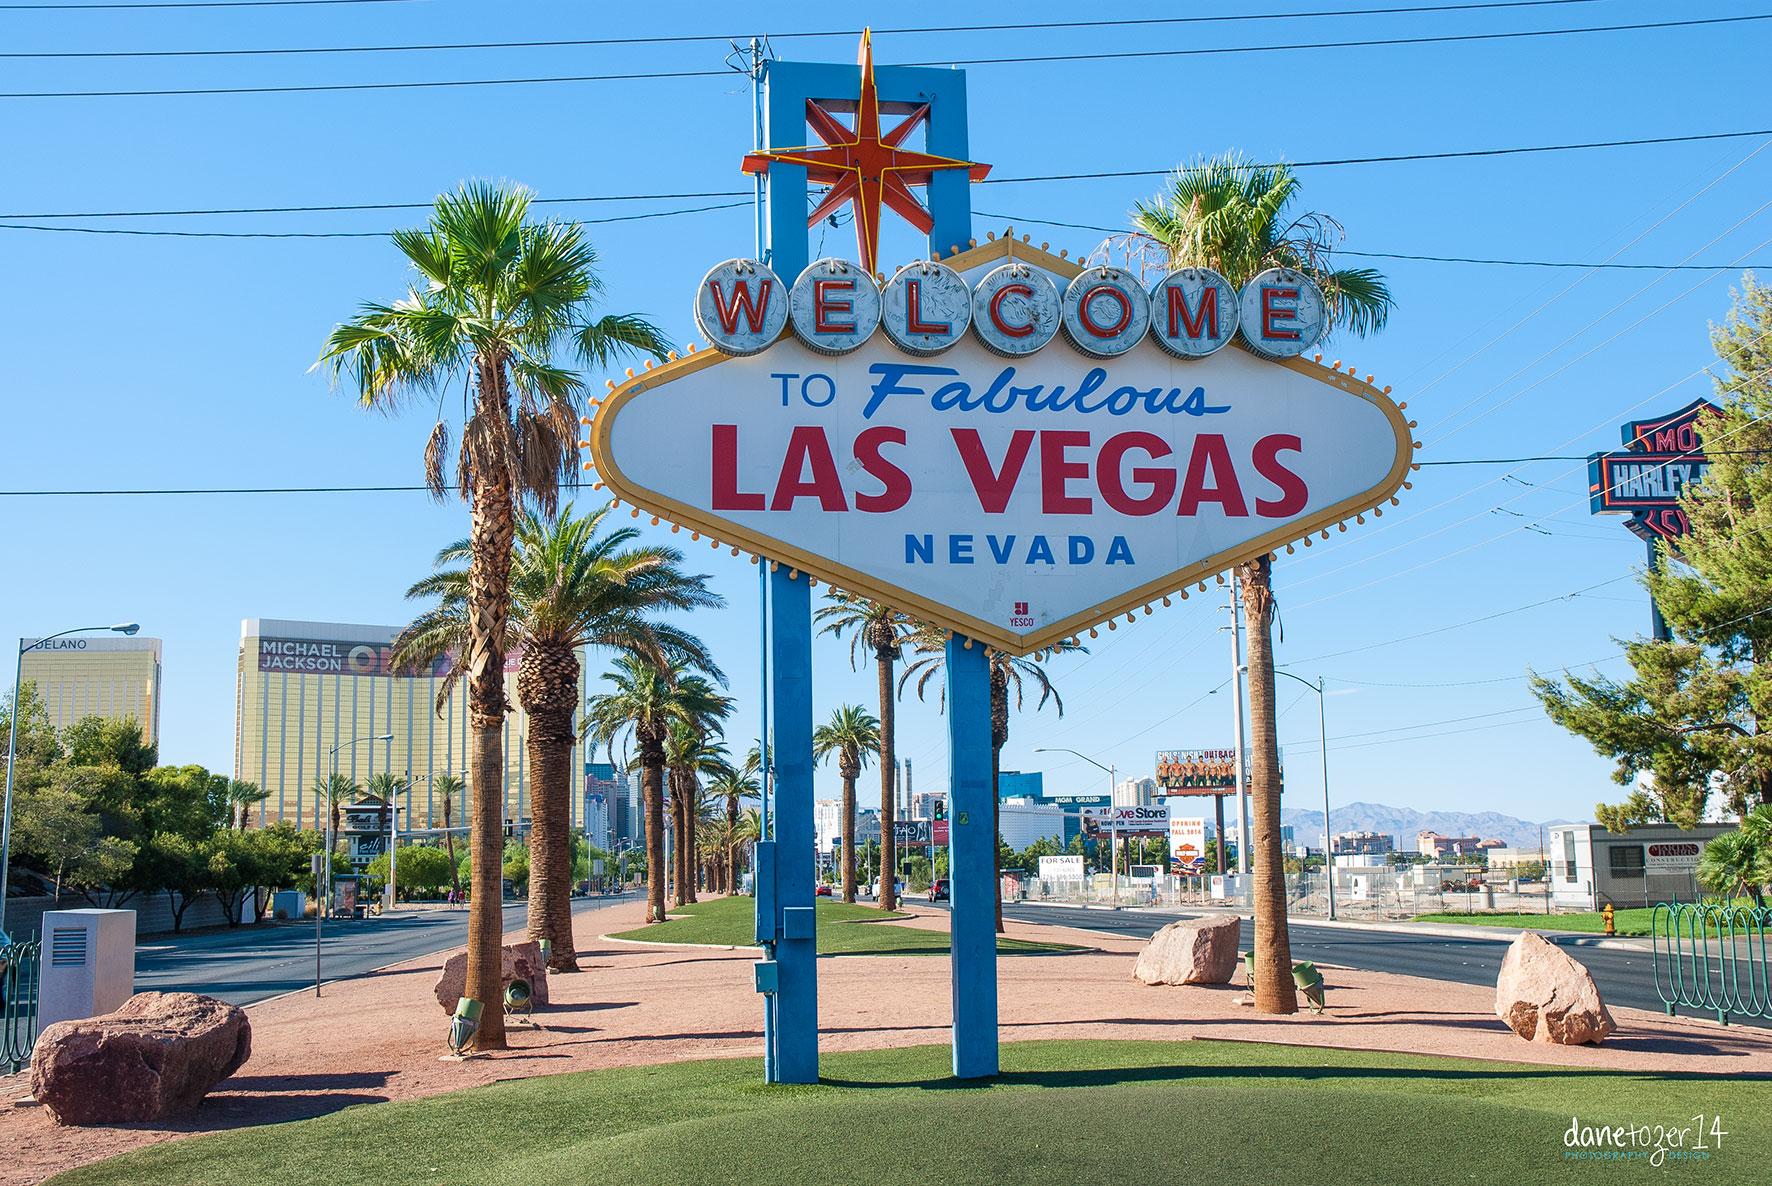 Las Vegas Nevada, U.S.A